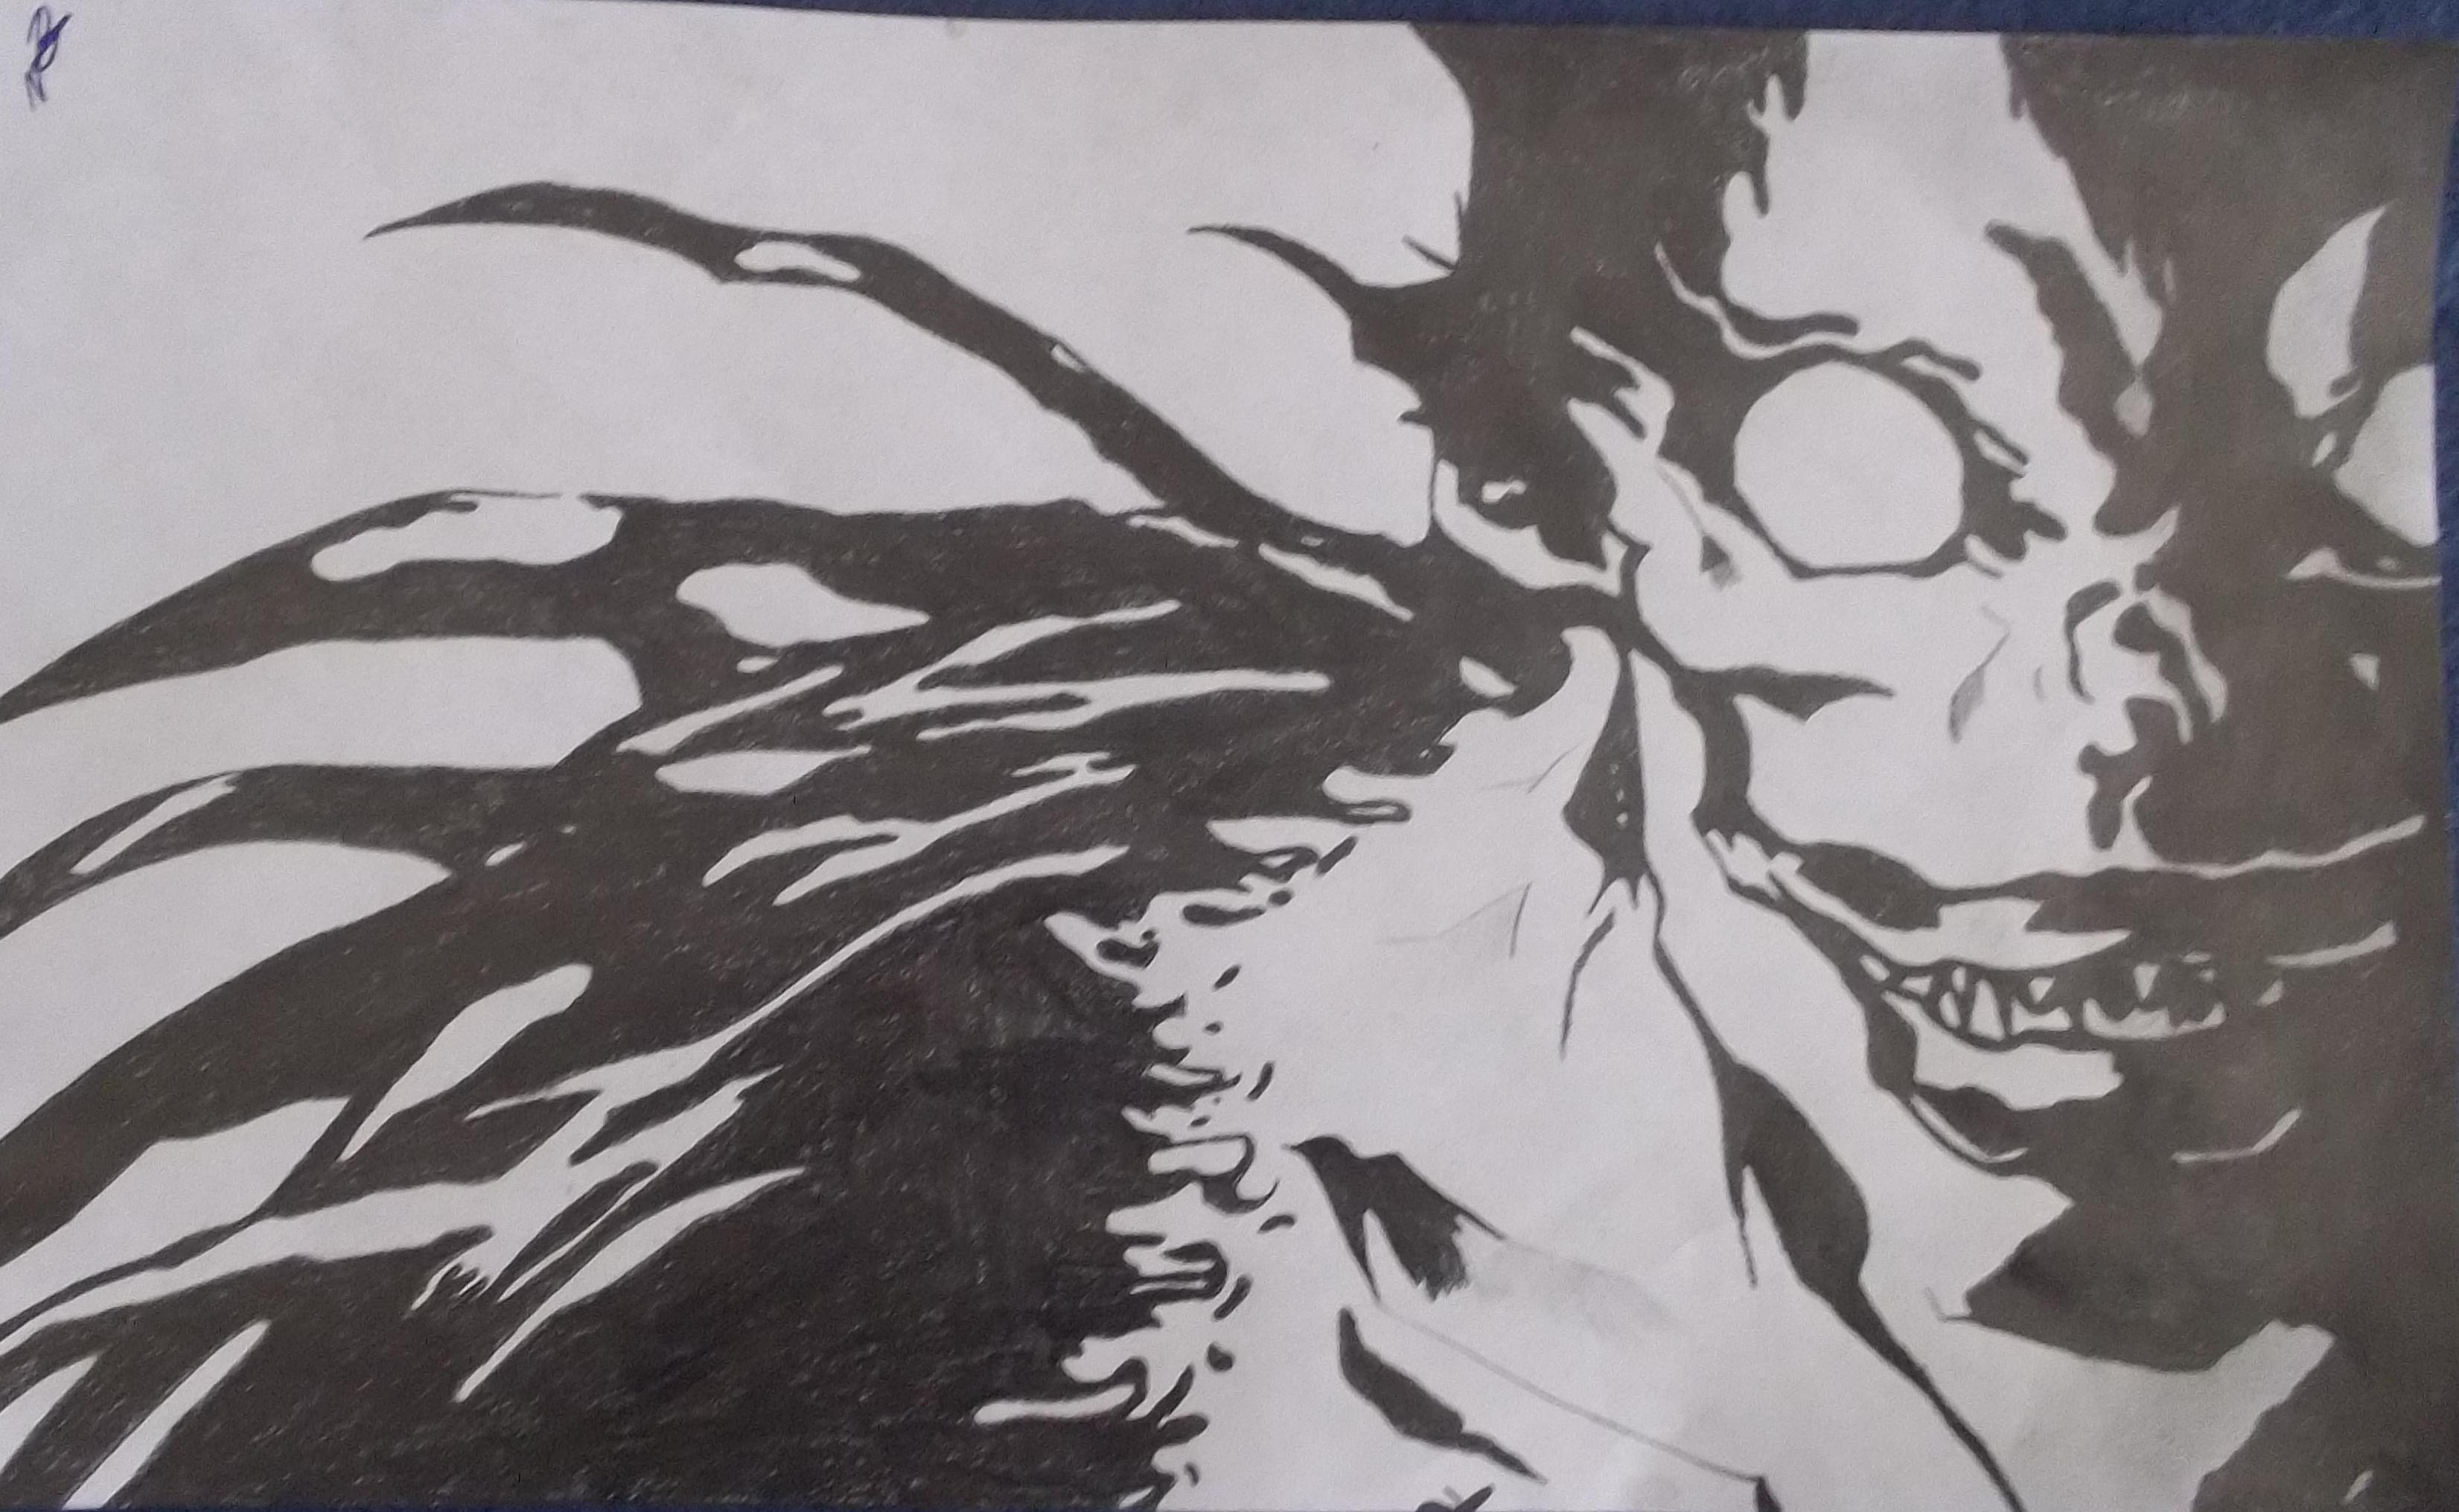 Ryuk Death Note By Ryufujin4 On Deviantart